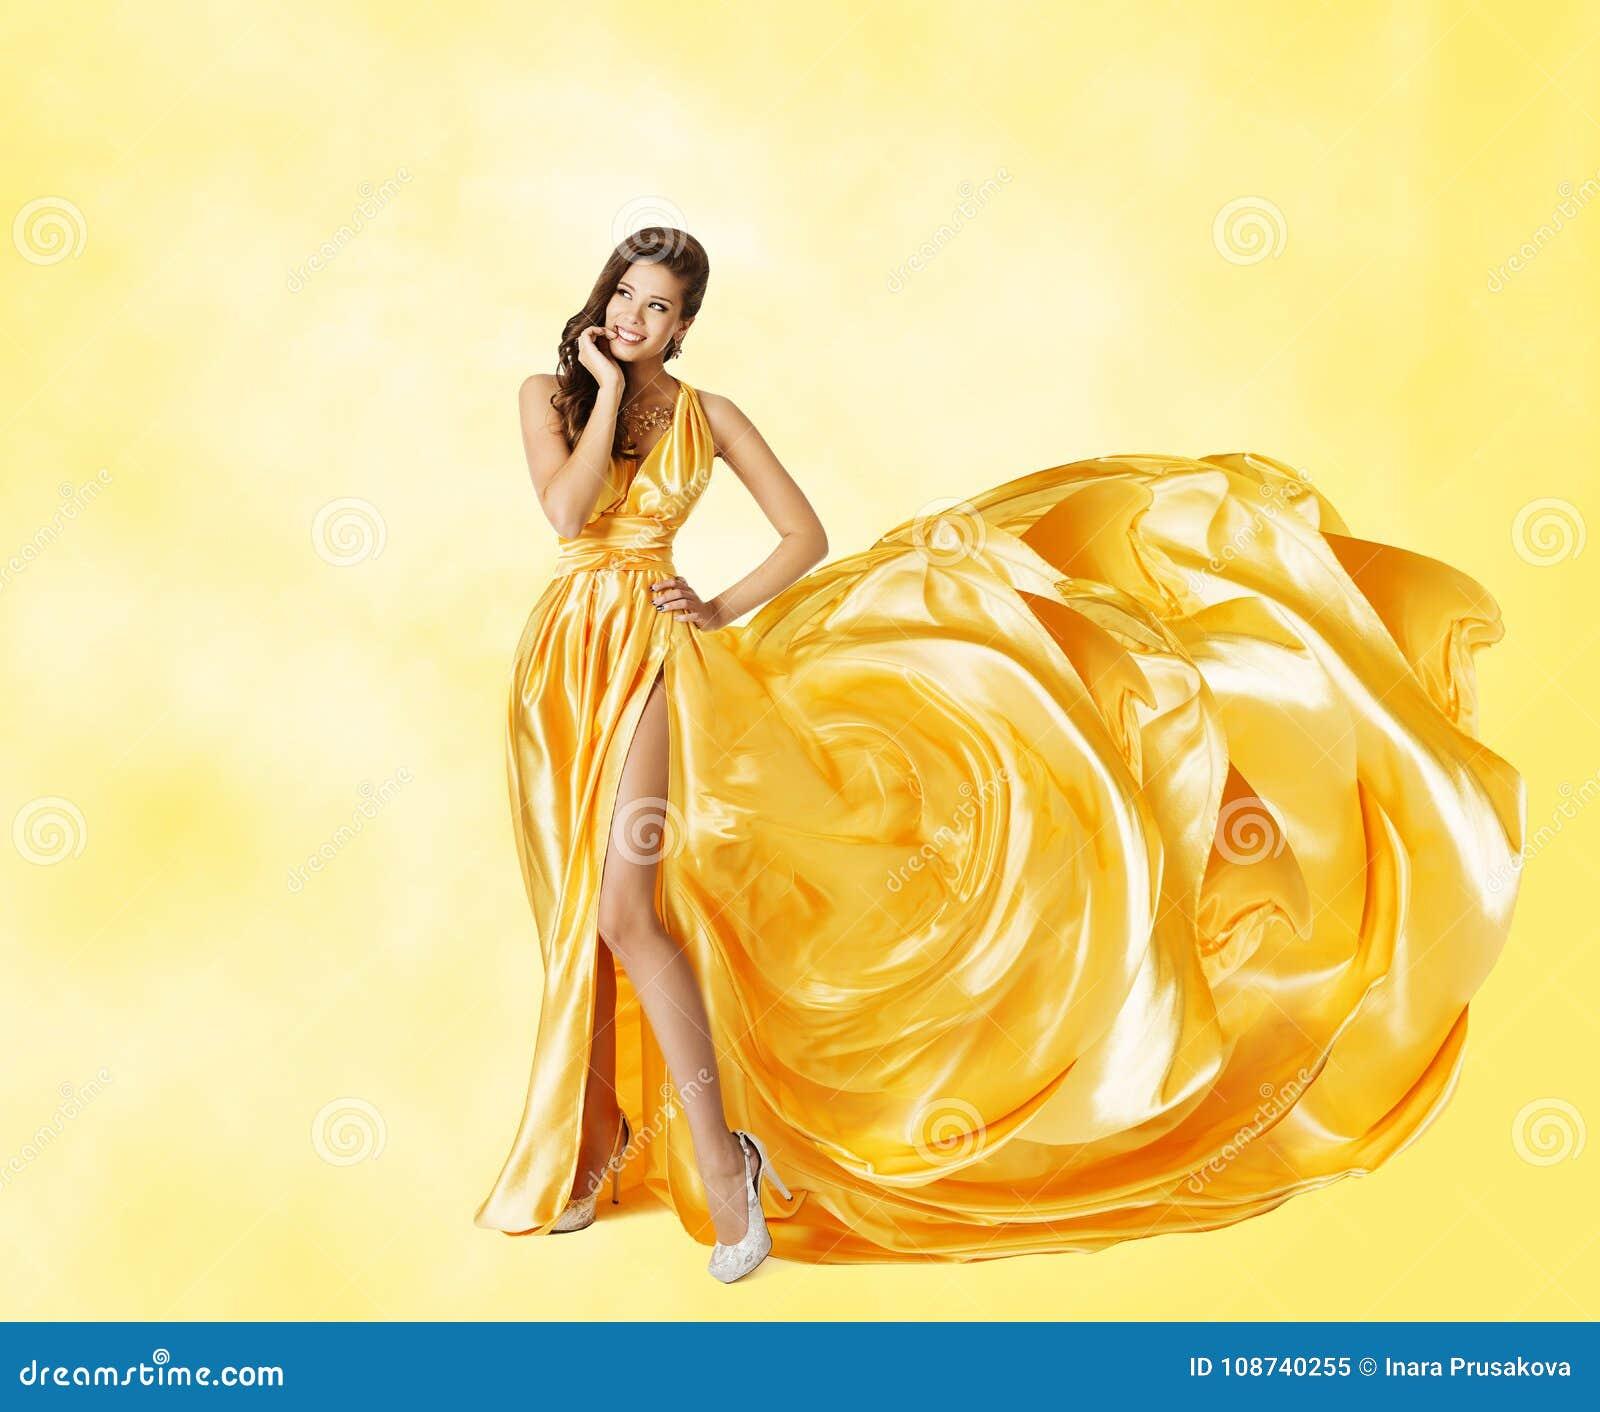 Woman Yellow Dress, Happy Fashion Model in Elegant Long Gown